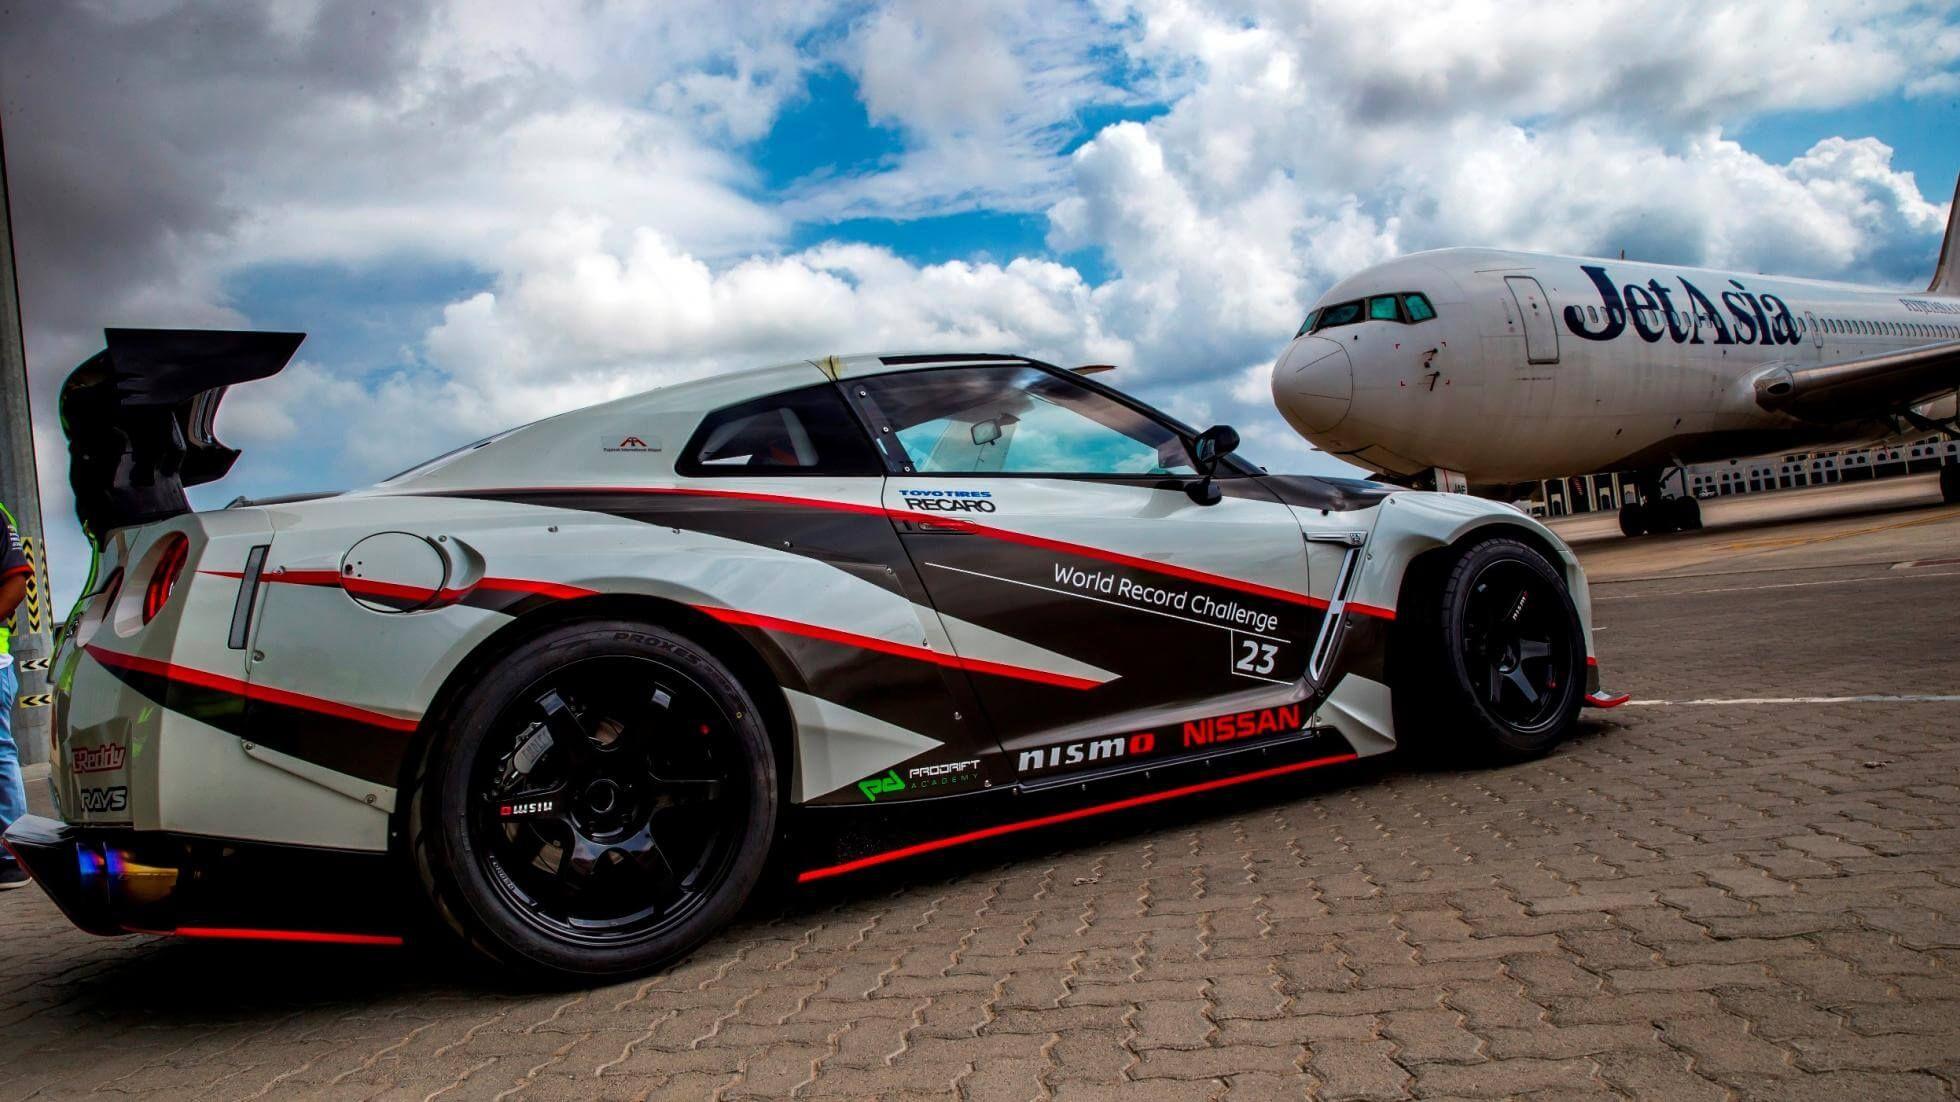 Nissan Gt R Nismo World Record Drift Gtr Customization Cars